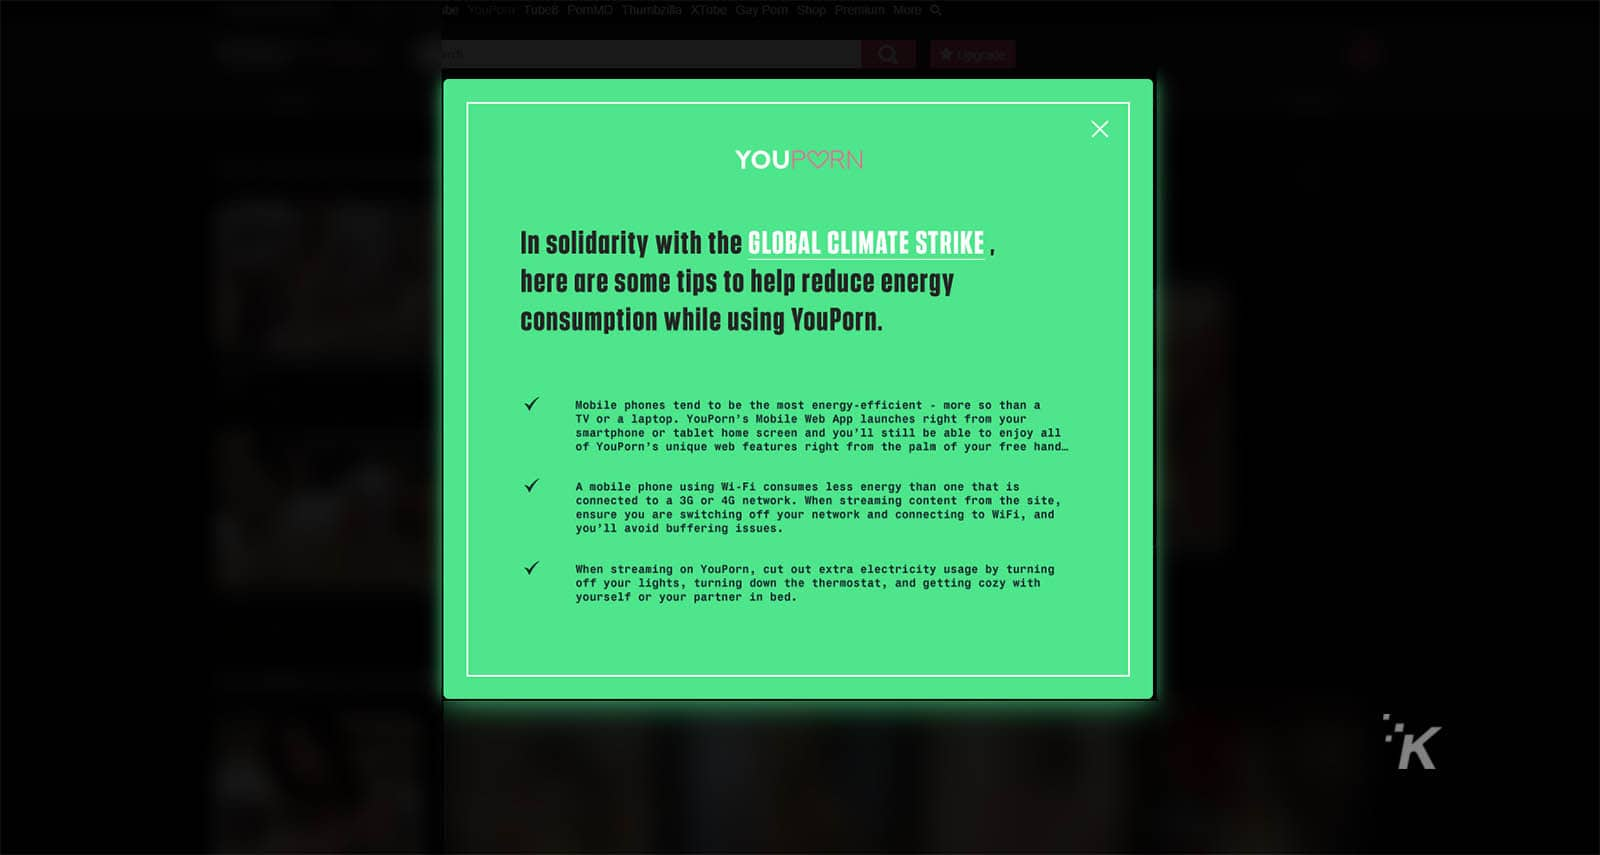 youporn energy saving tips